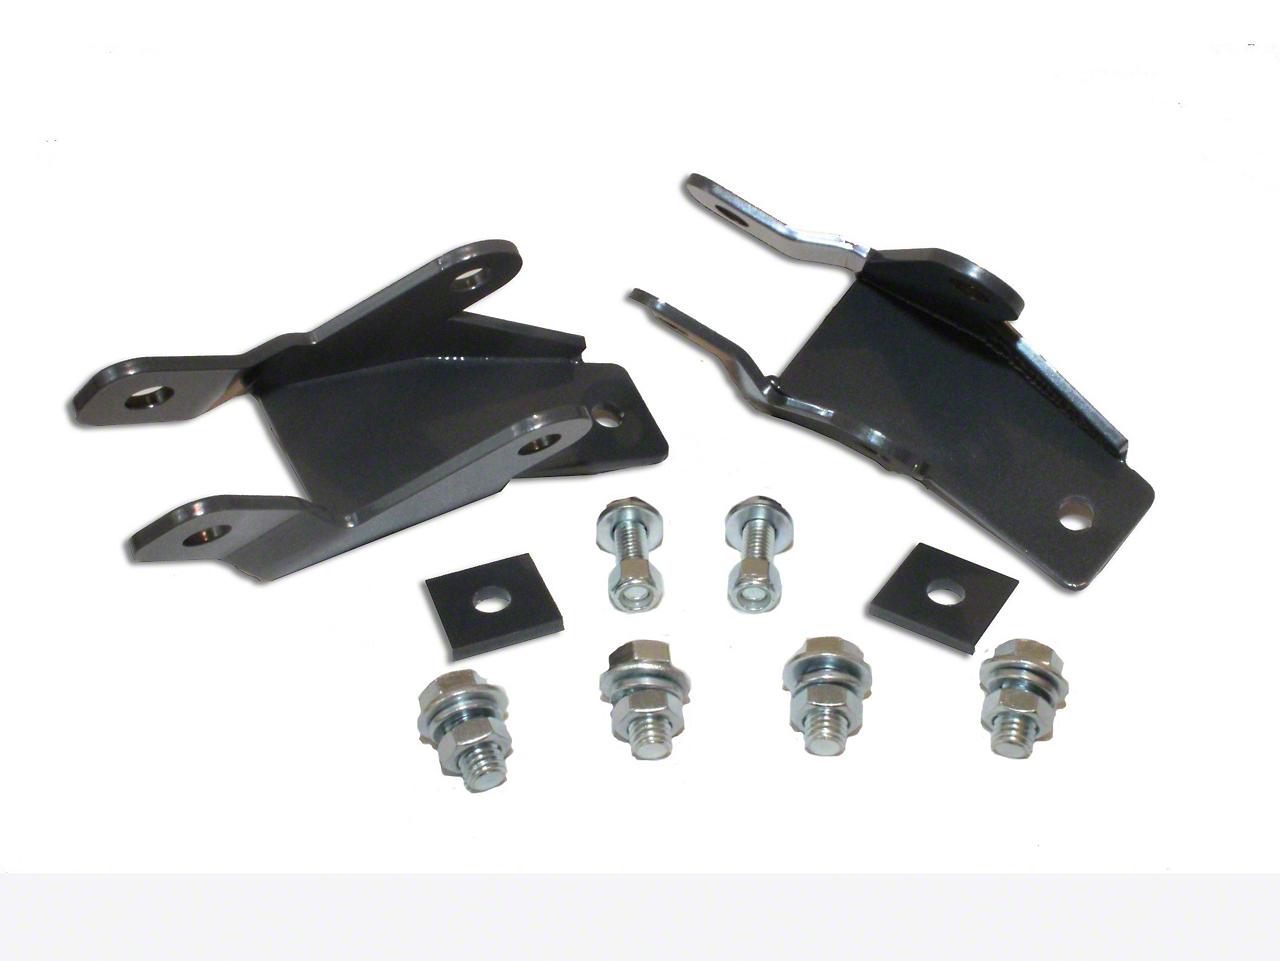 Max Trac Rear Shock Extenders for 4-7 in. Flip Kit (07-18 Silverado 1500)